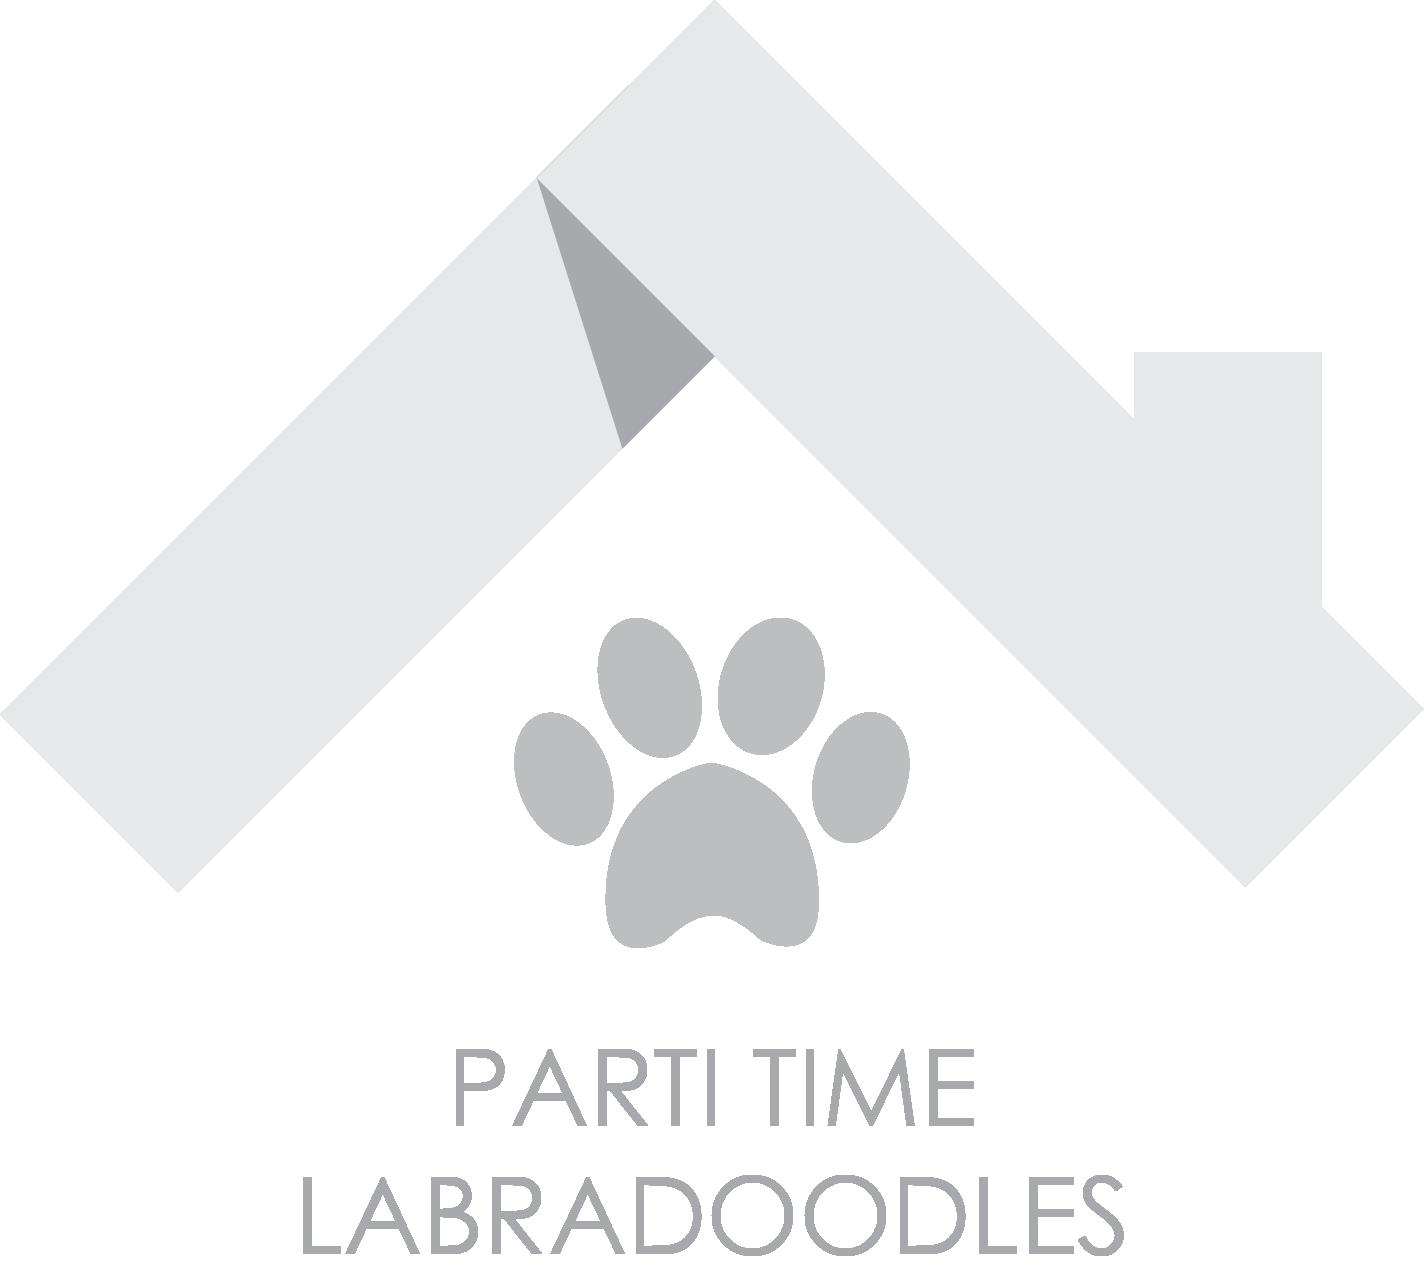 Parti Time Labradoodles